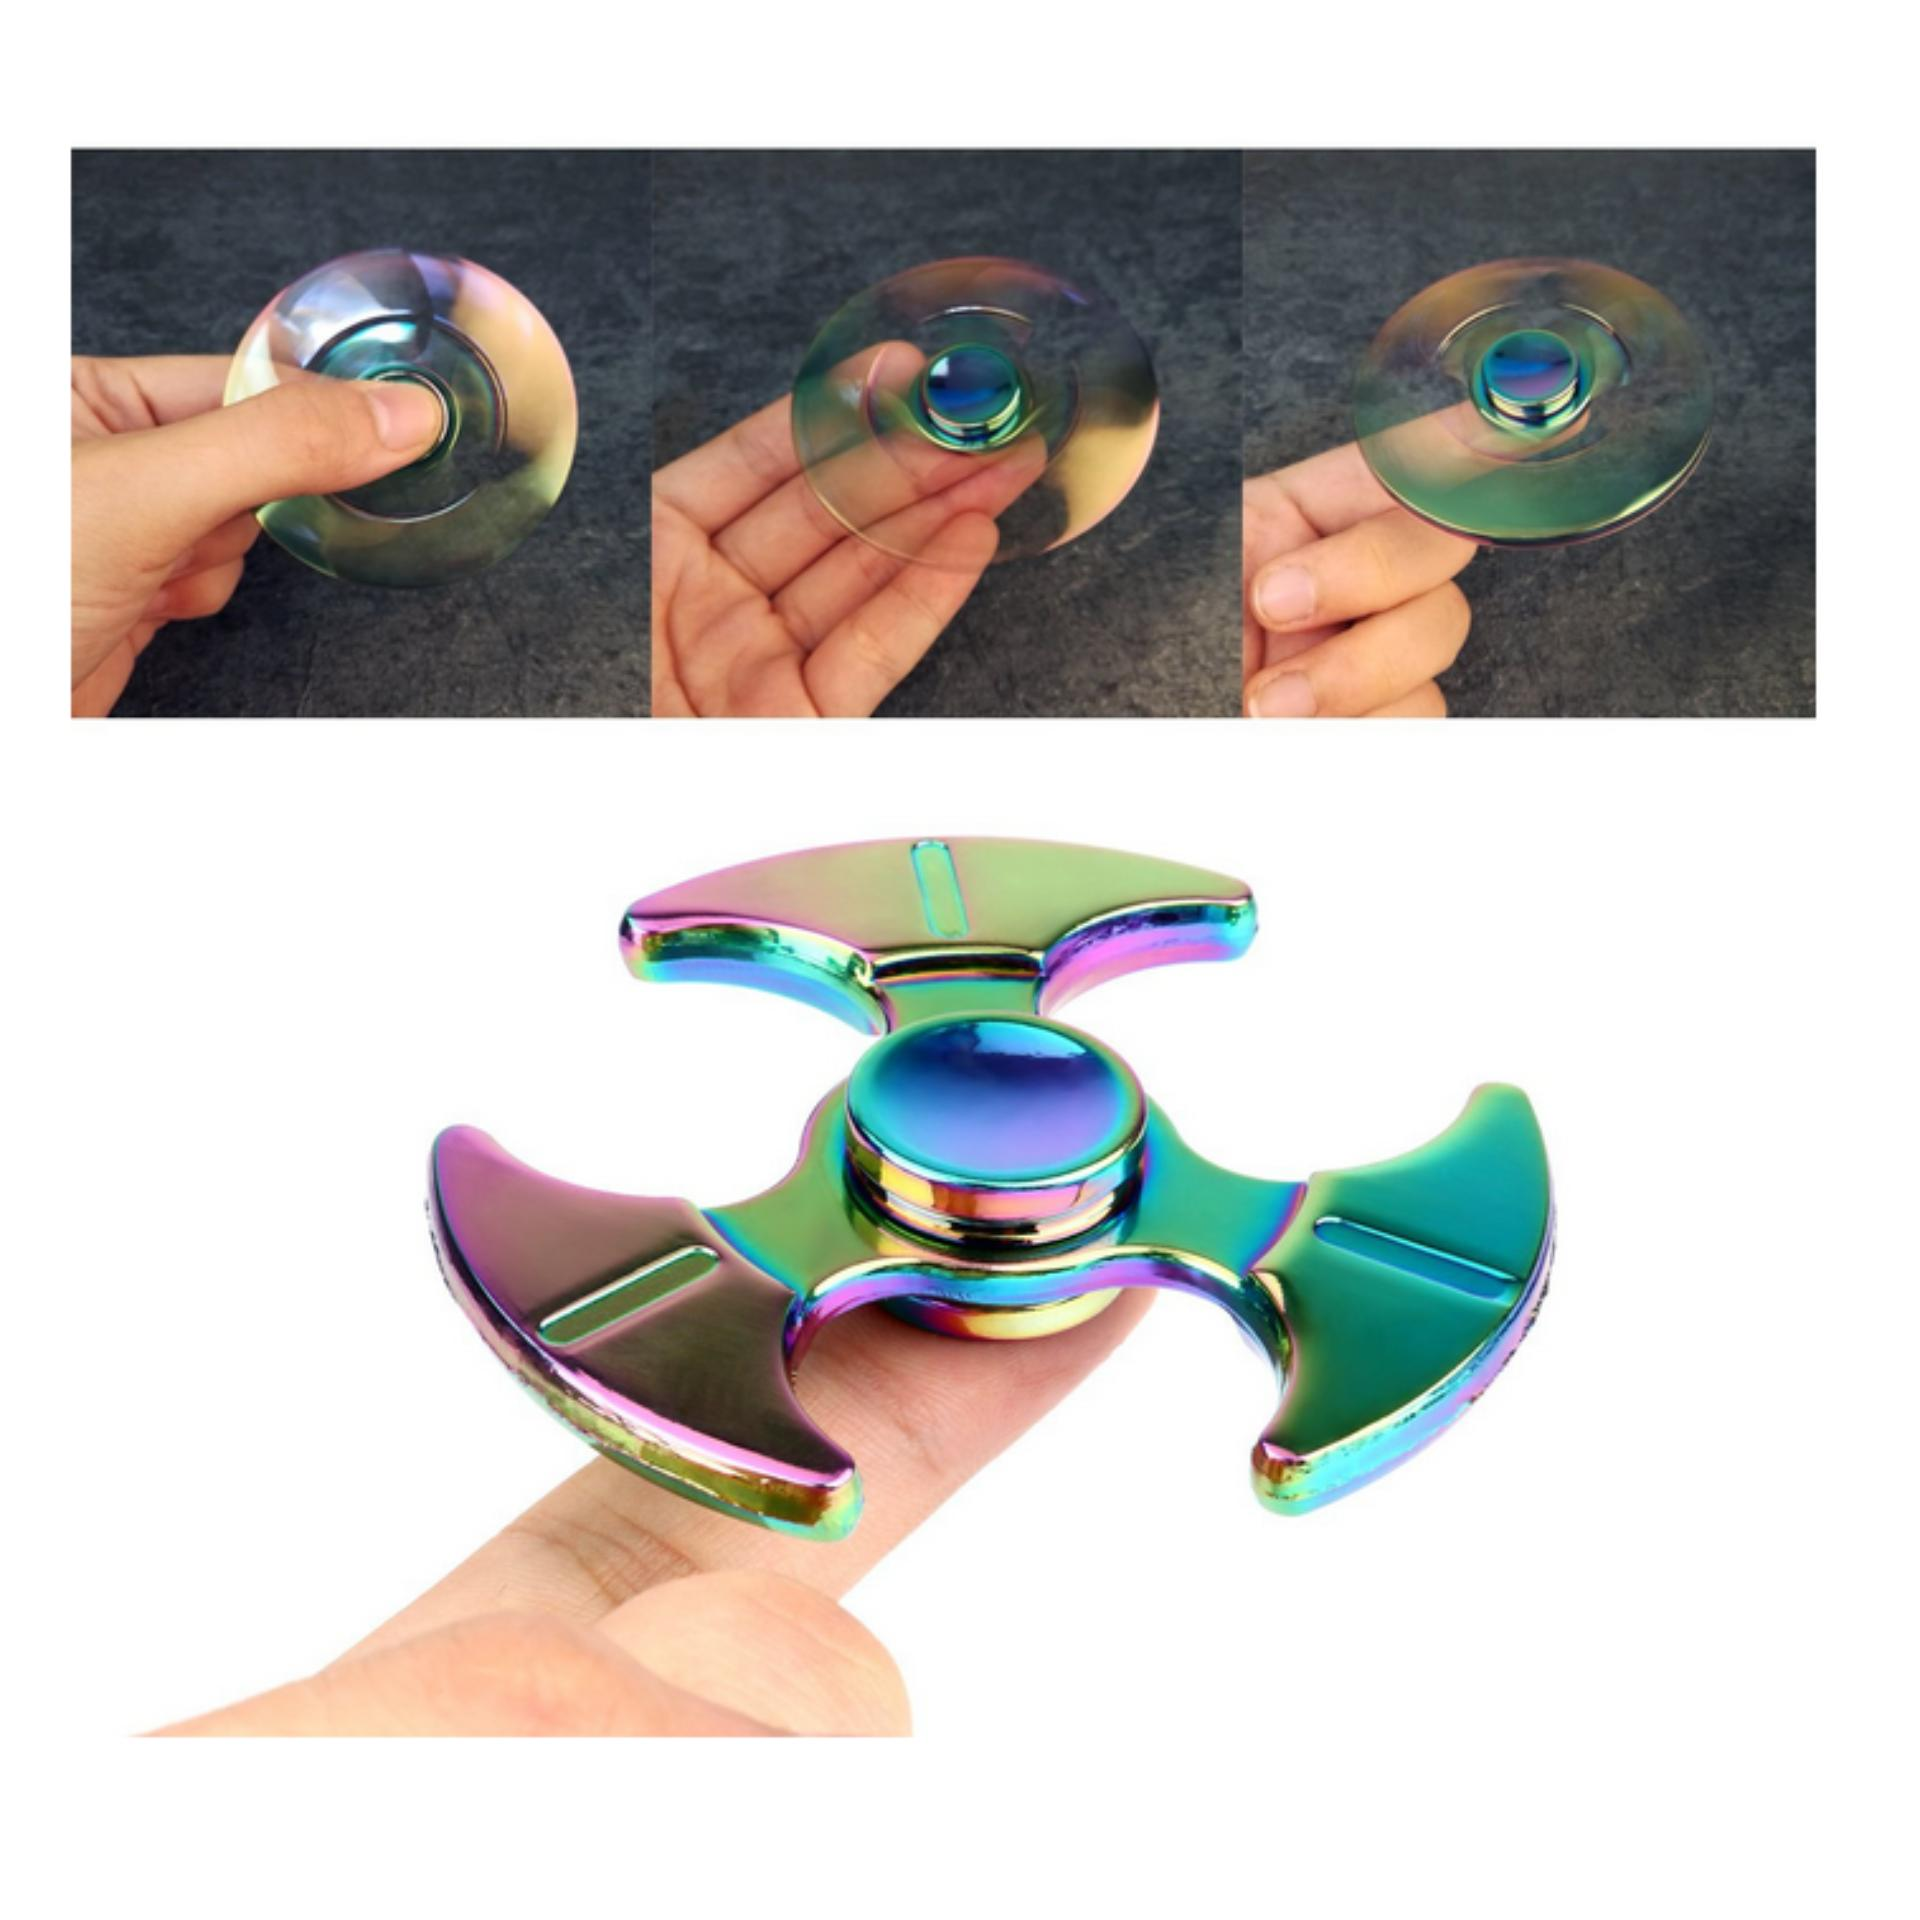 Askey Fidget Spinner Hand Premium Iridescent Rainbow Series Mainan 3 Circle Arms Star Limited Edition Anti